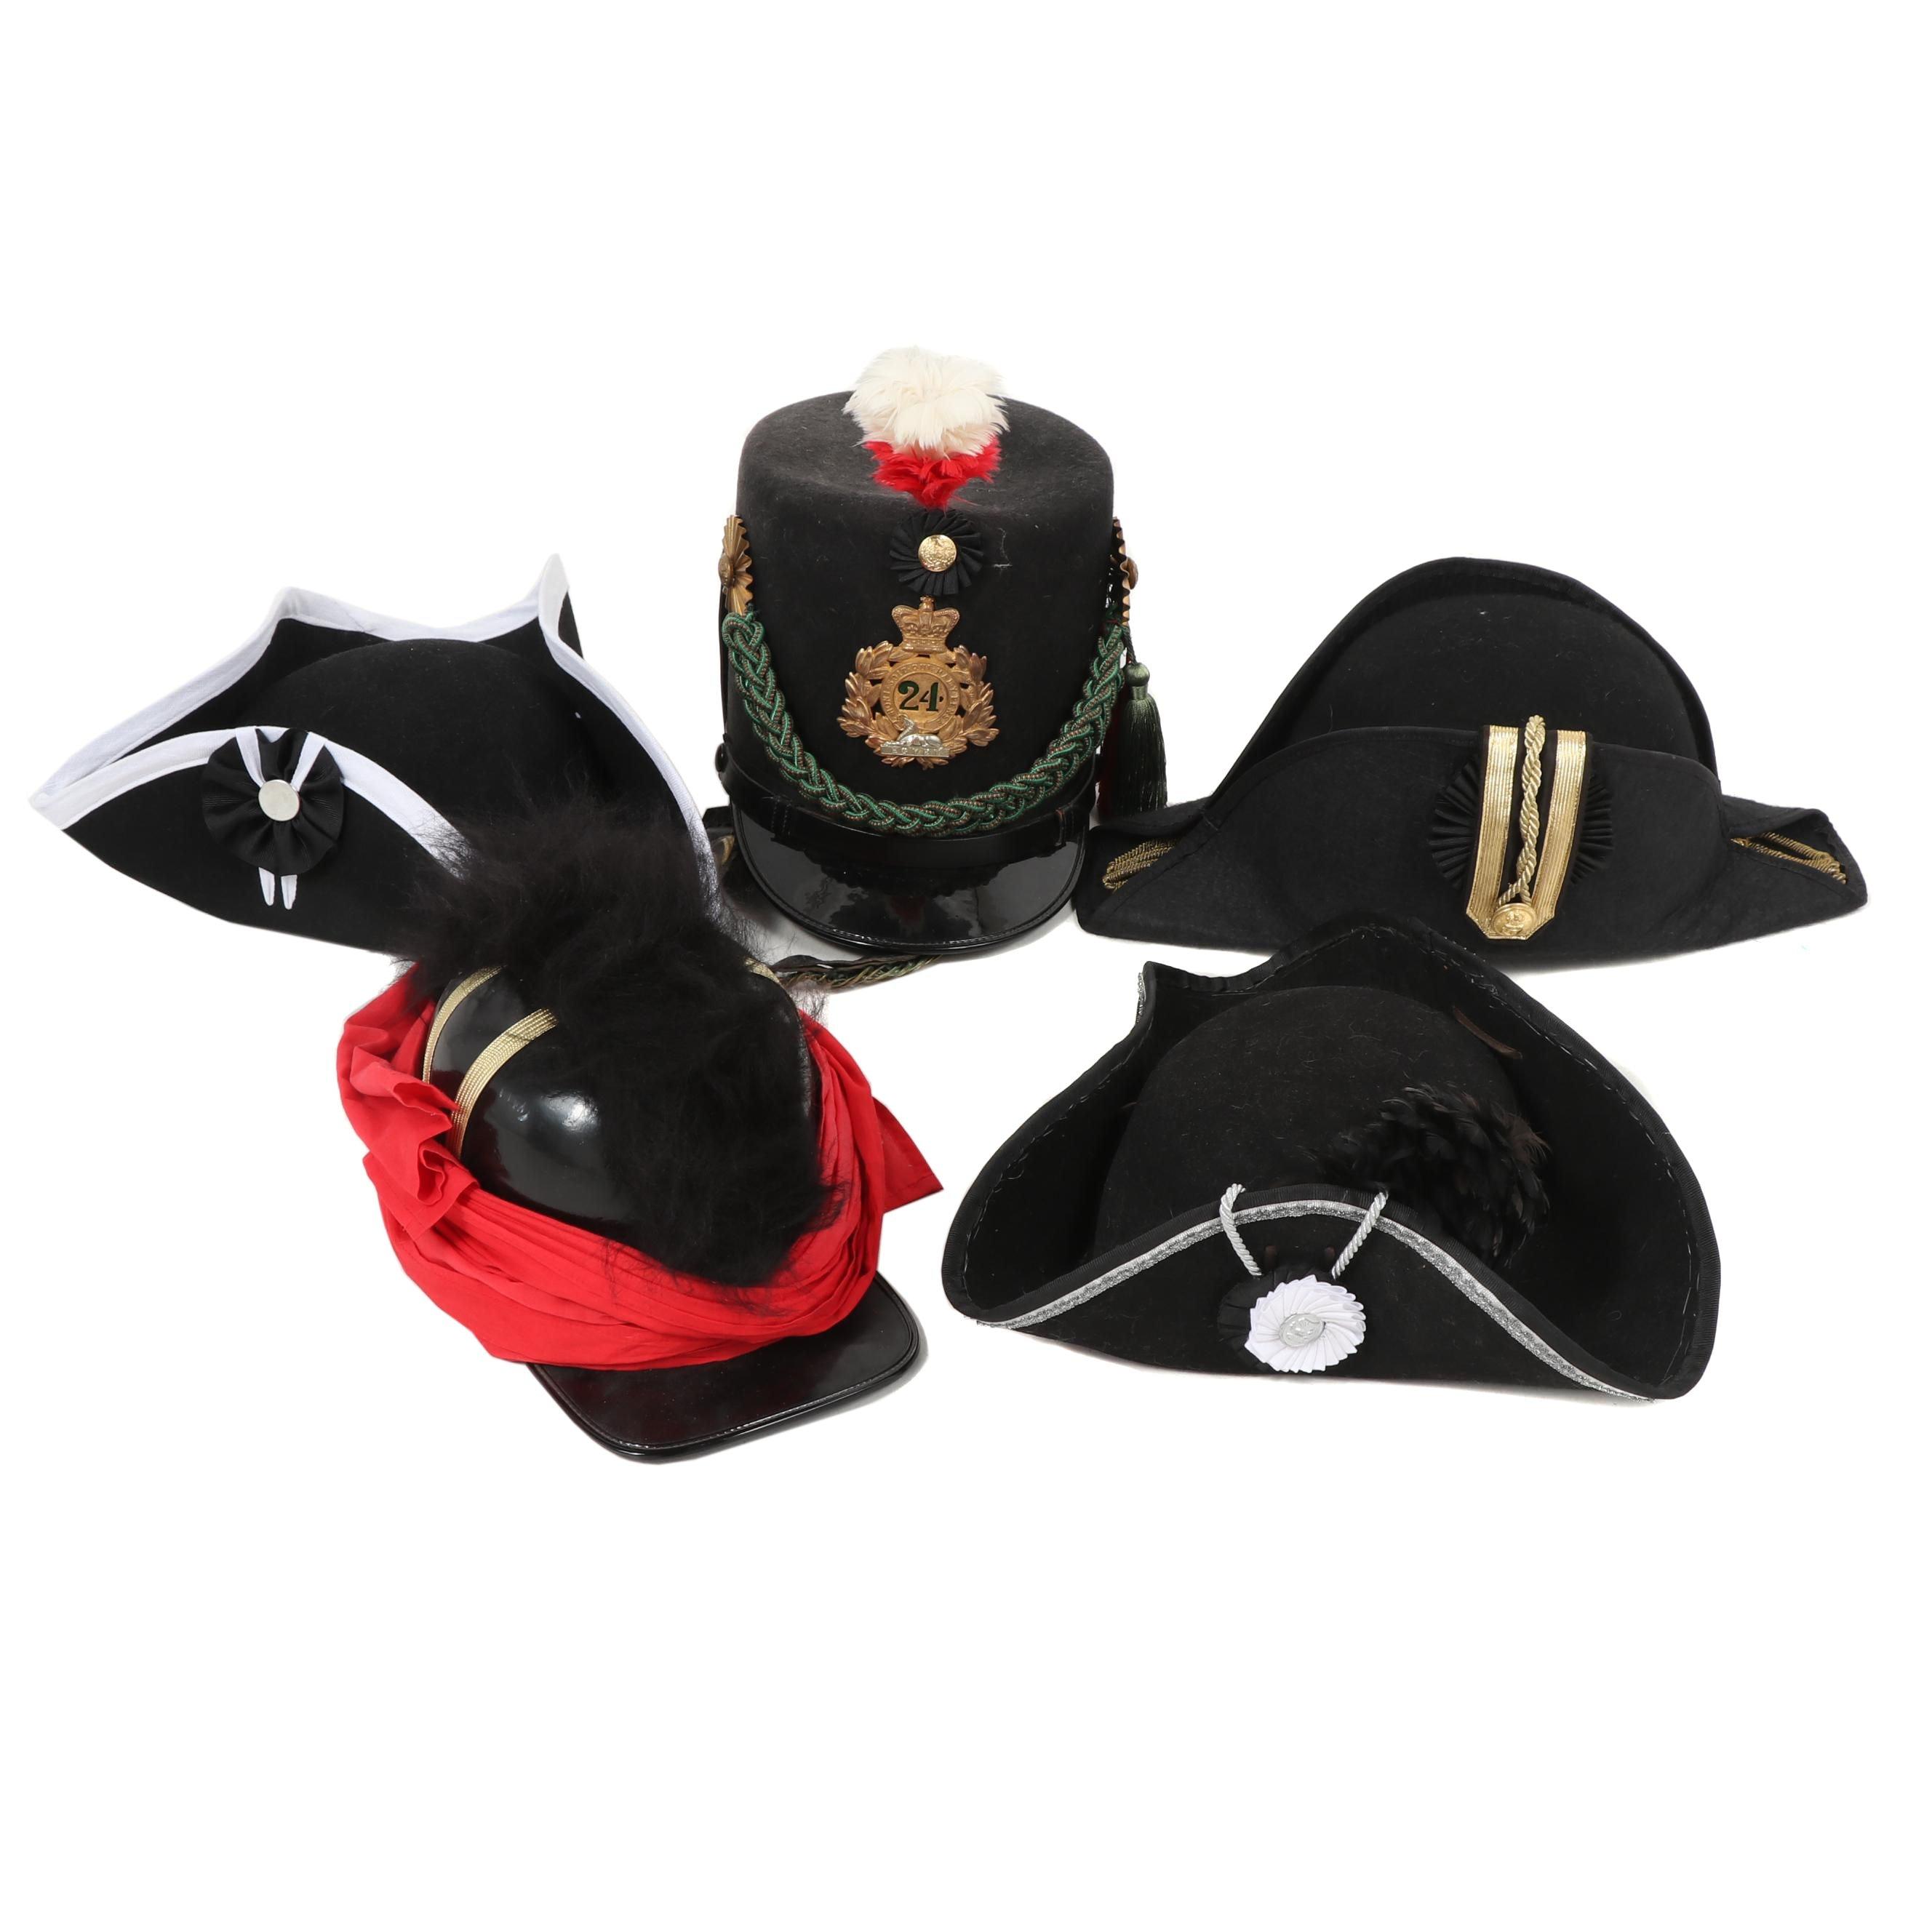 Men's Replica and Costume Military Hats